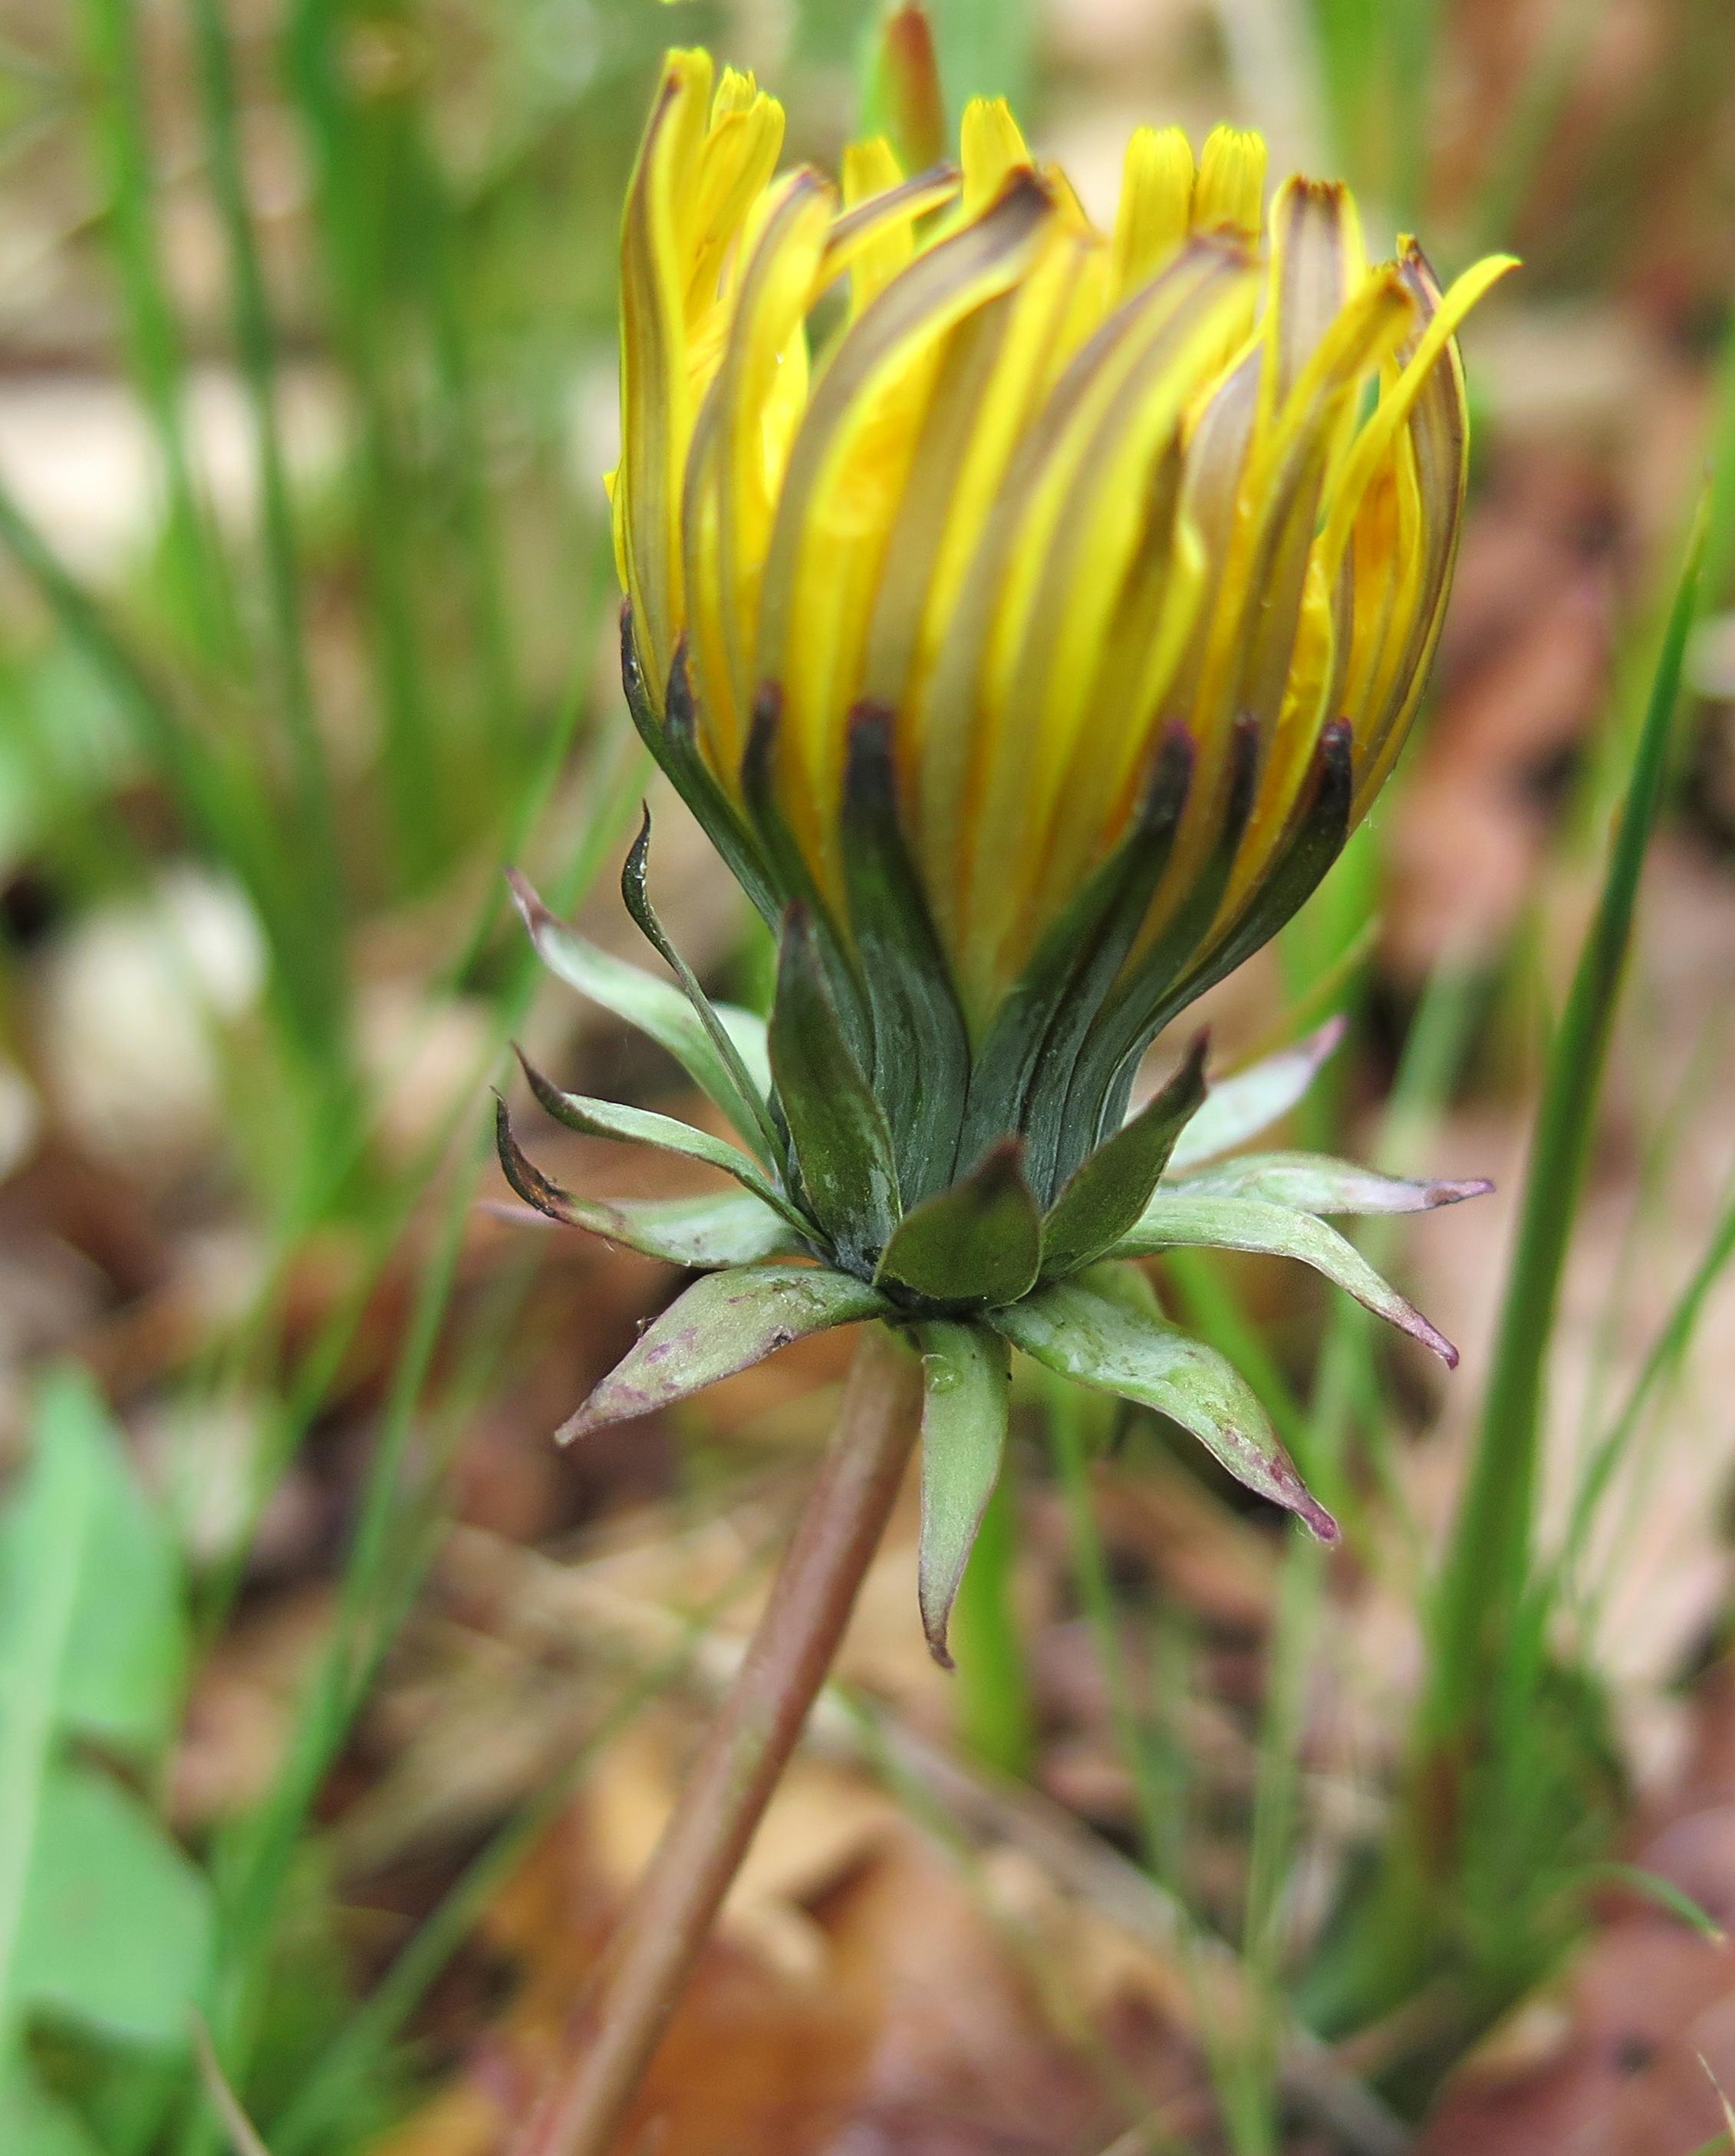 Taraxacum prionum (door Otto Zijlstra)